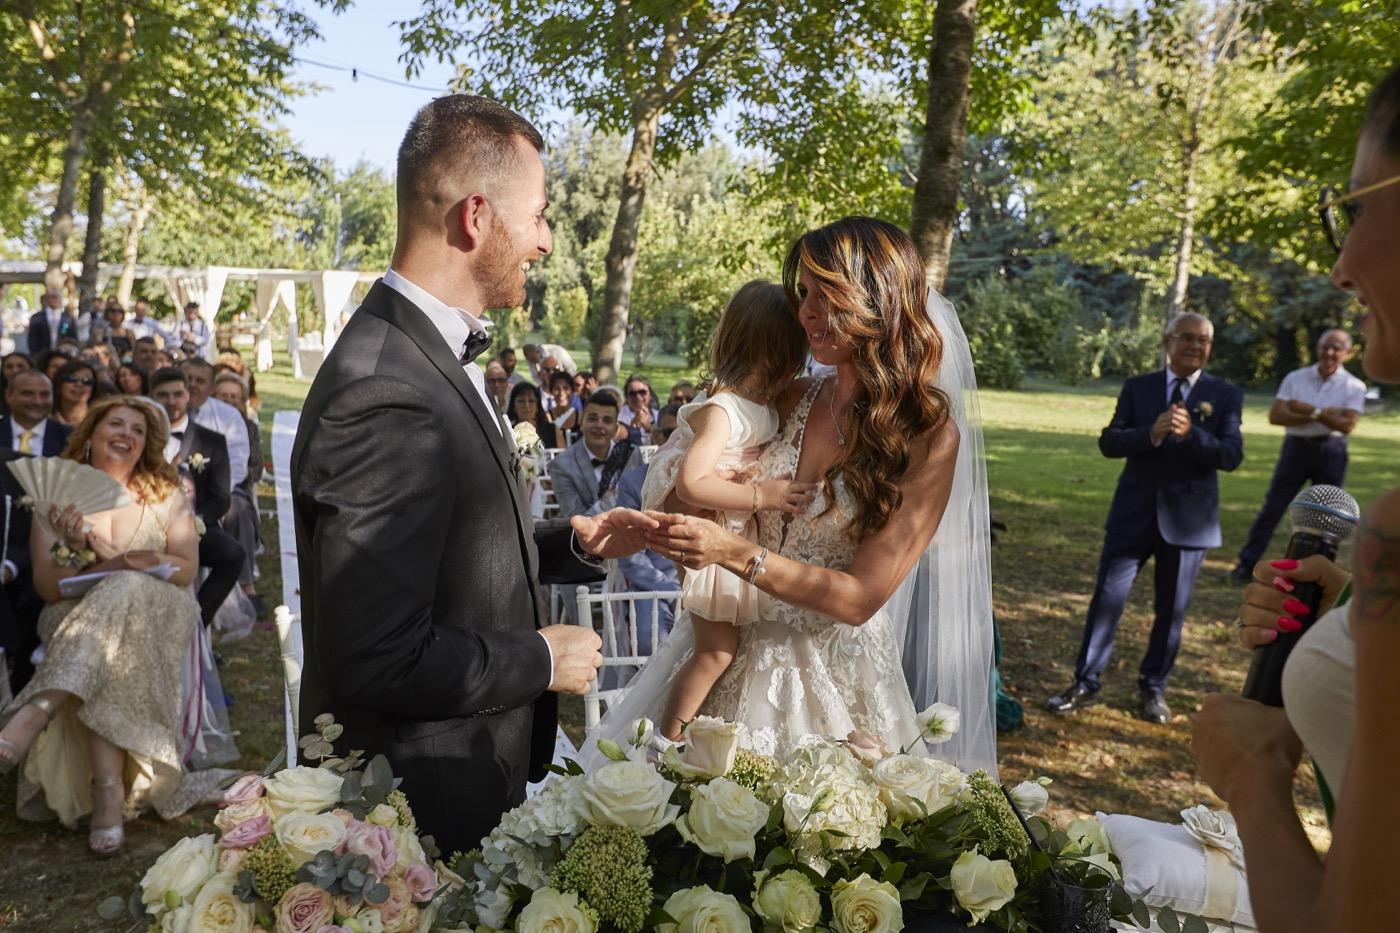 Claudio-Coppola-wedding-photographer-la-scuderia-eventi-preparativi-la-rosetta-perugia-59